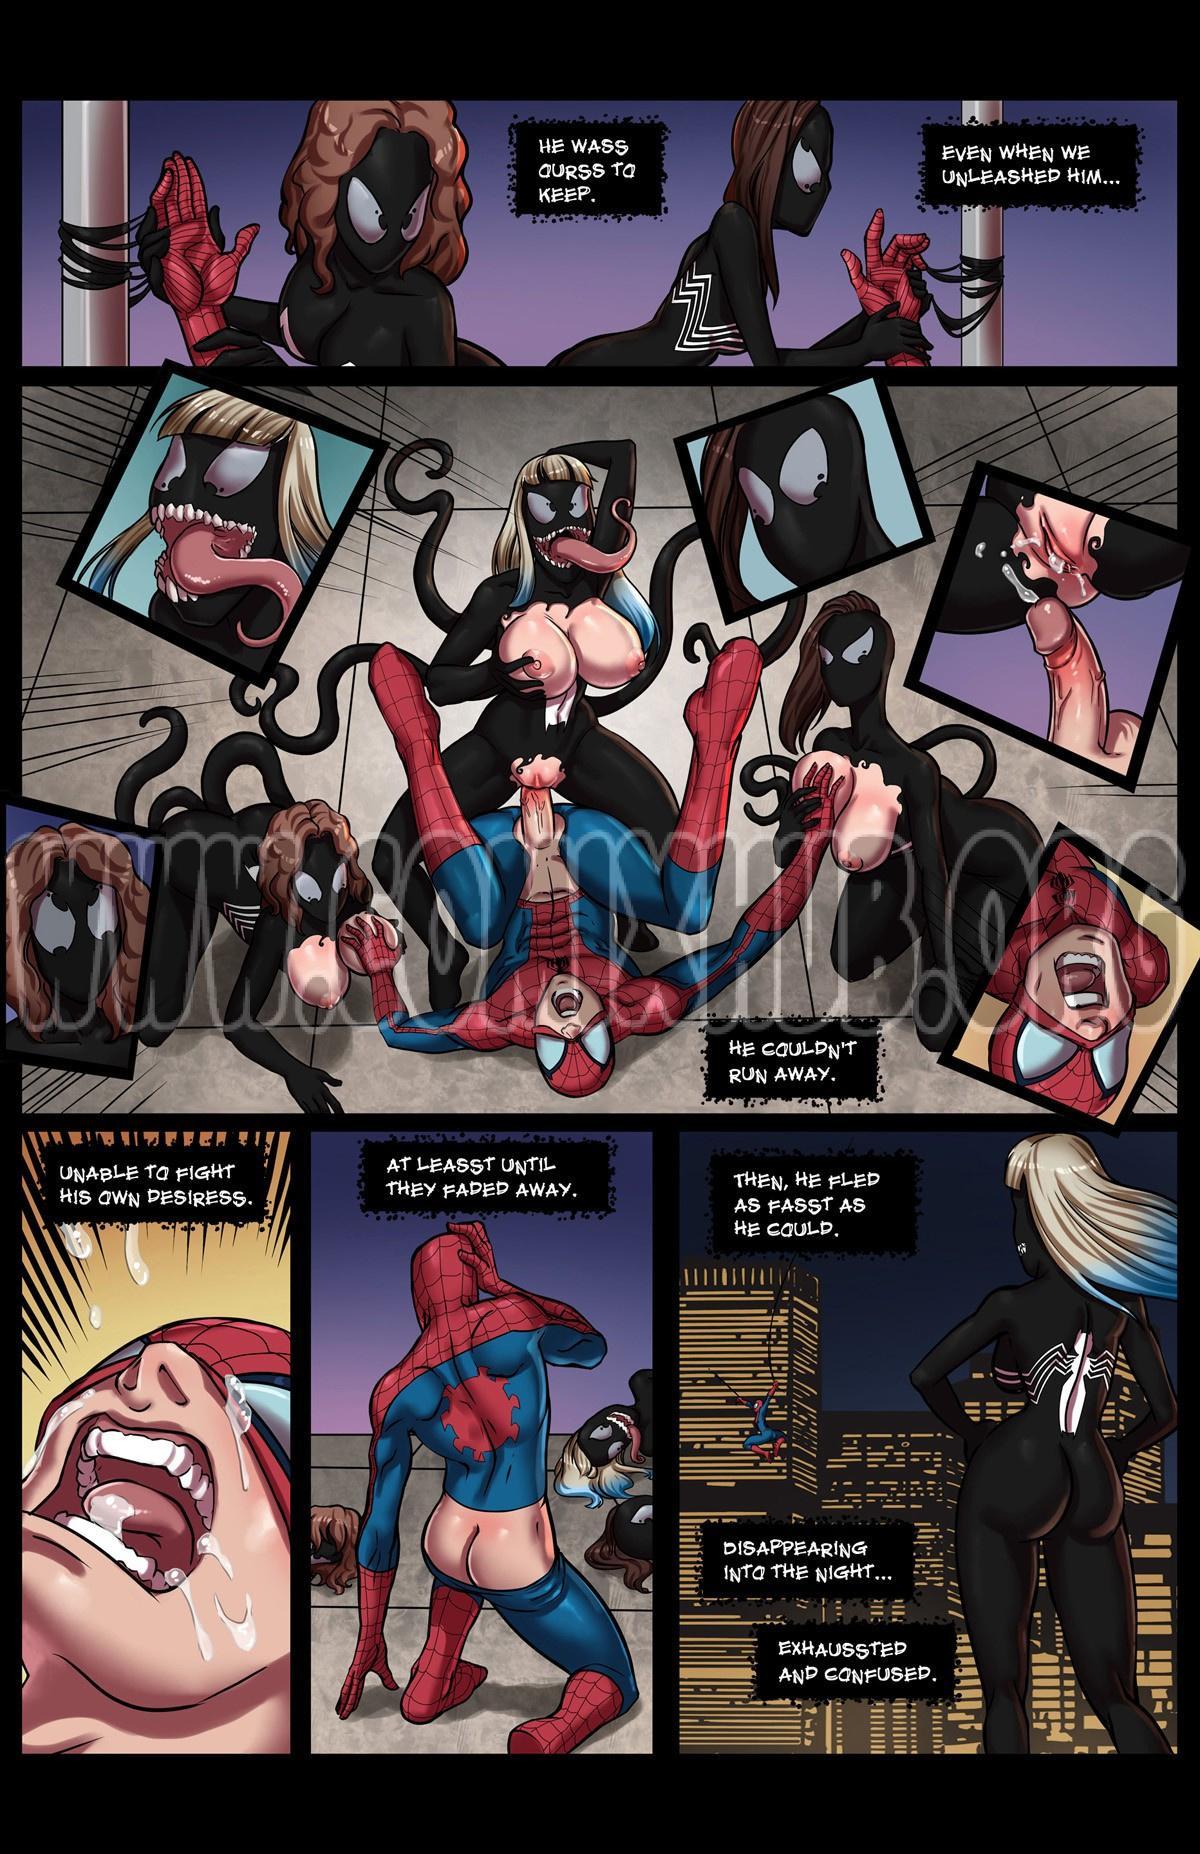 Venom Stalks Spidey porn comics Oral sex, Blowjob, Creampie, Cum Swallow, cunnilingus, Group Sex, Sex Toys, Straight